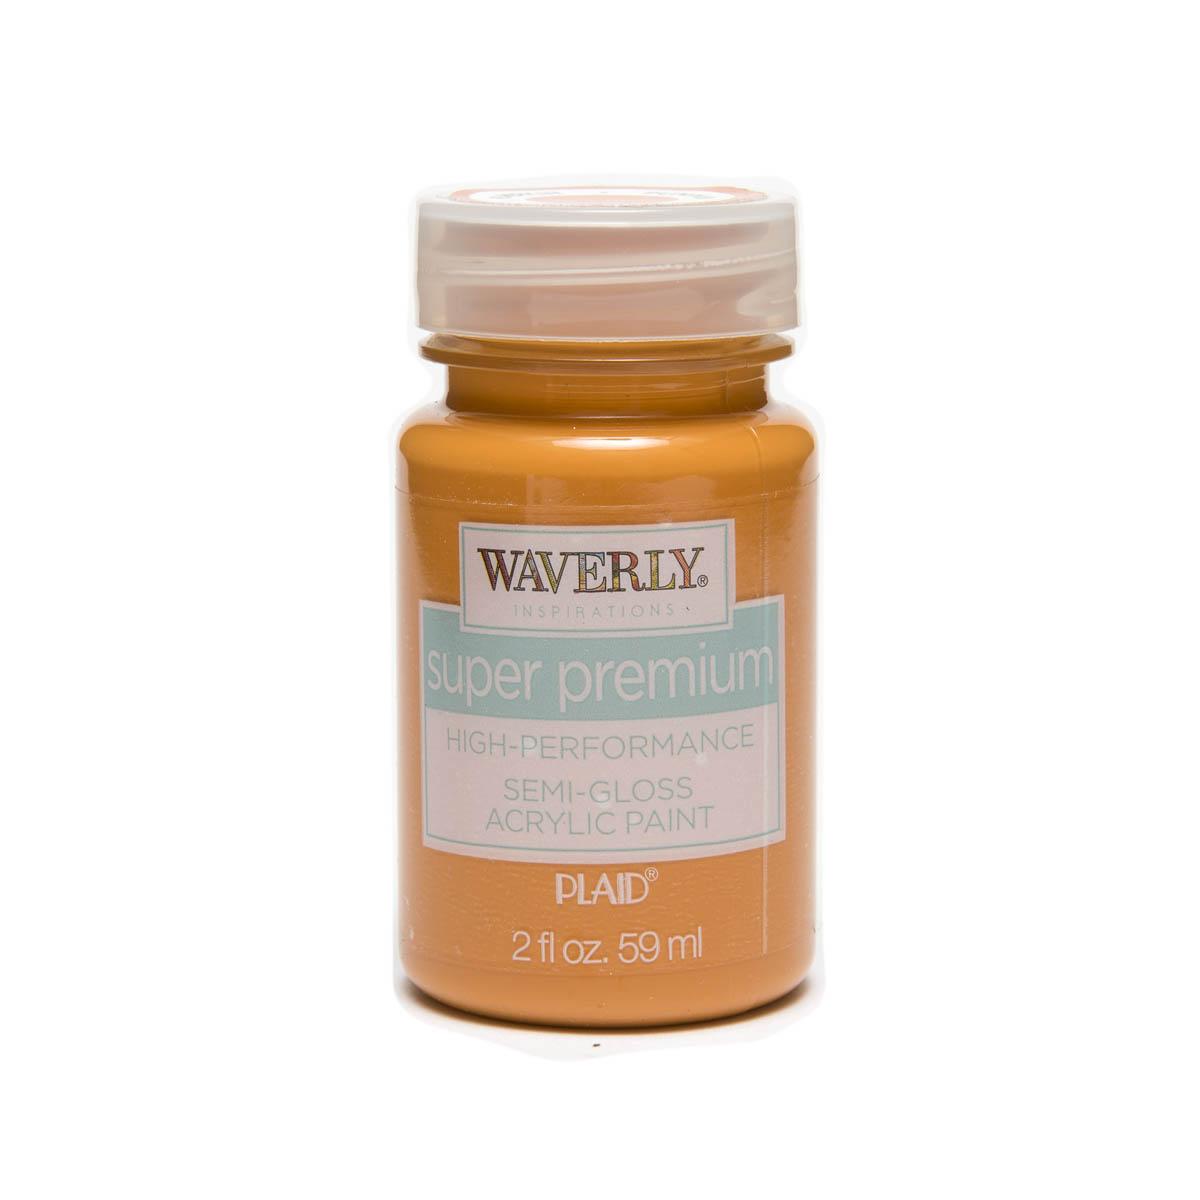 Waverly ® Inspirations Super Premium Semi-Gloss Acrylic Paint - Pumpkin, 2 oz.